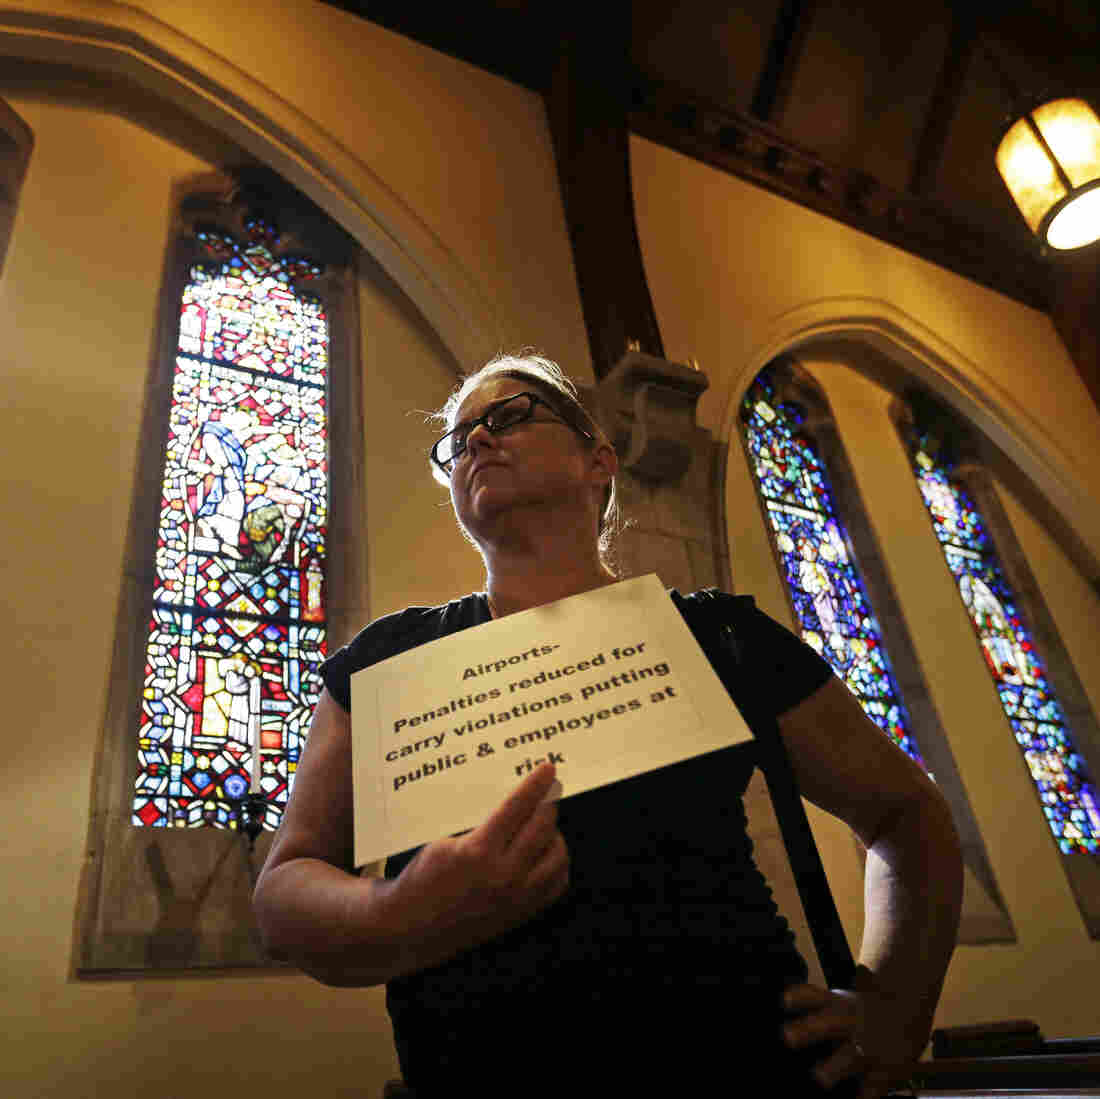 Georgia Law OKs Guns In Schools, Churches